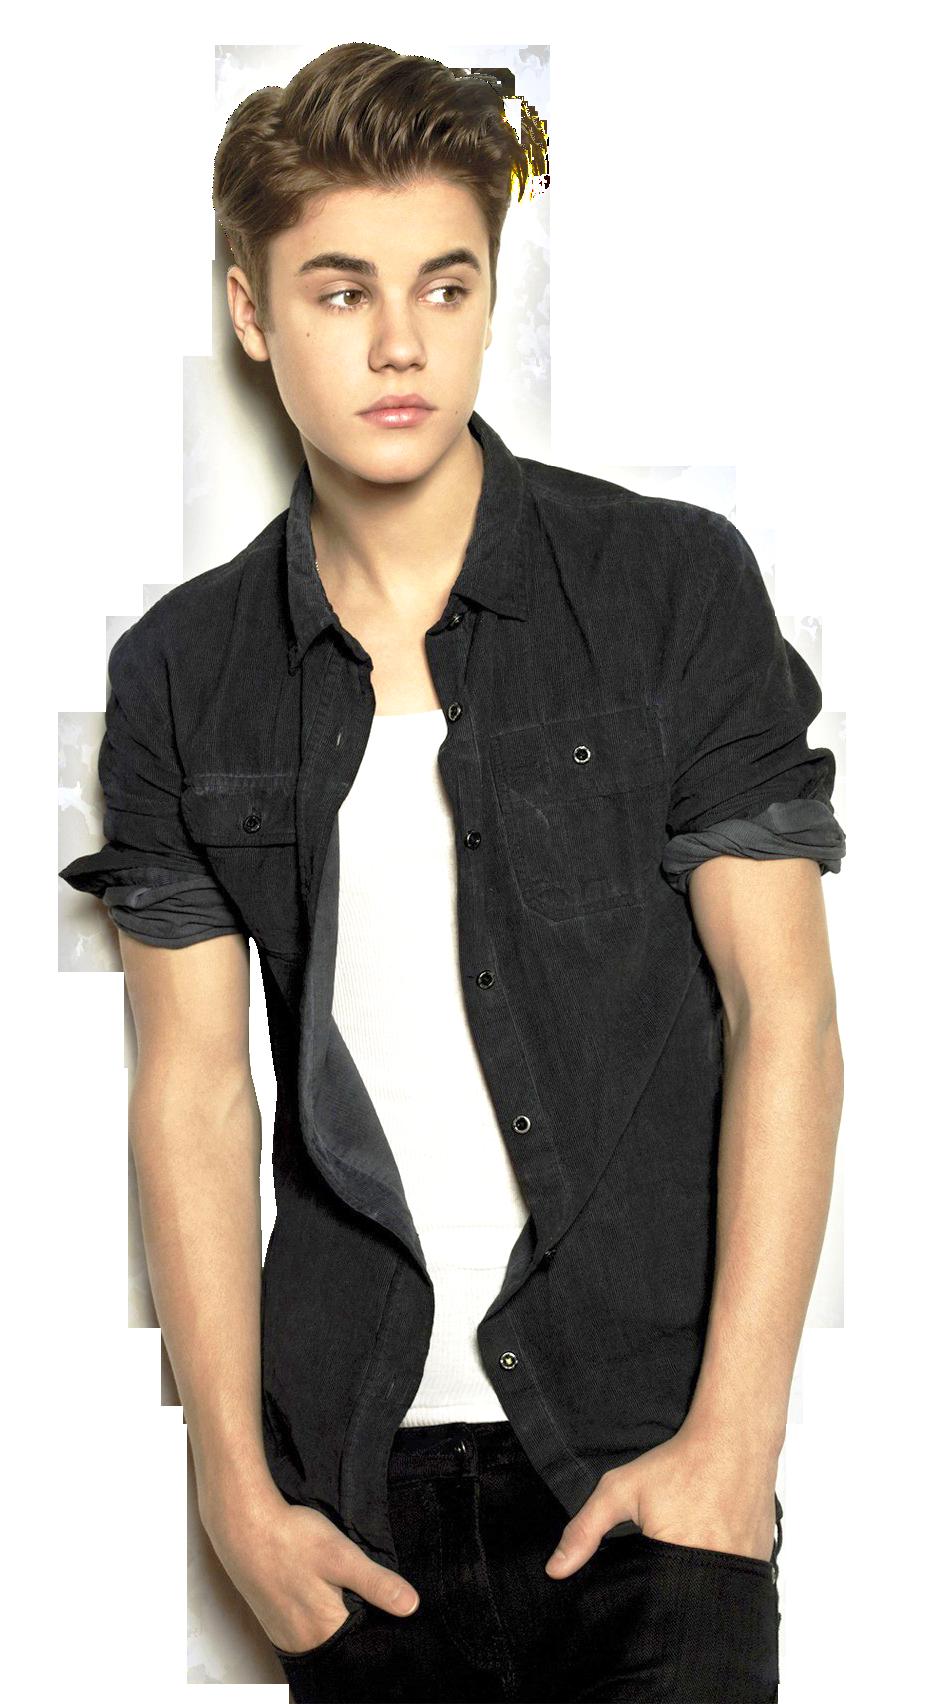 A Famous Singer Justin Bieber